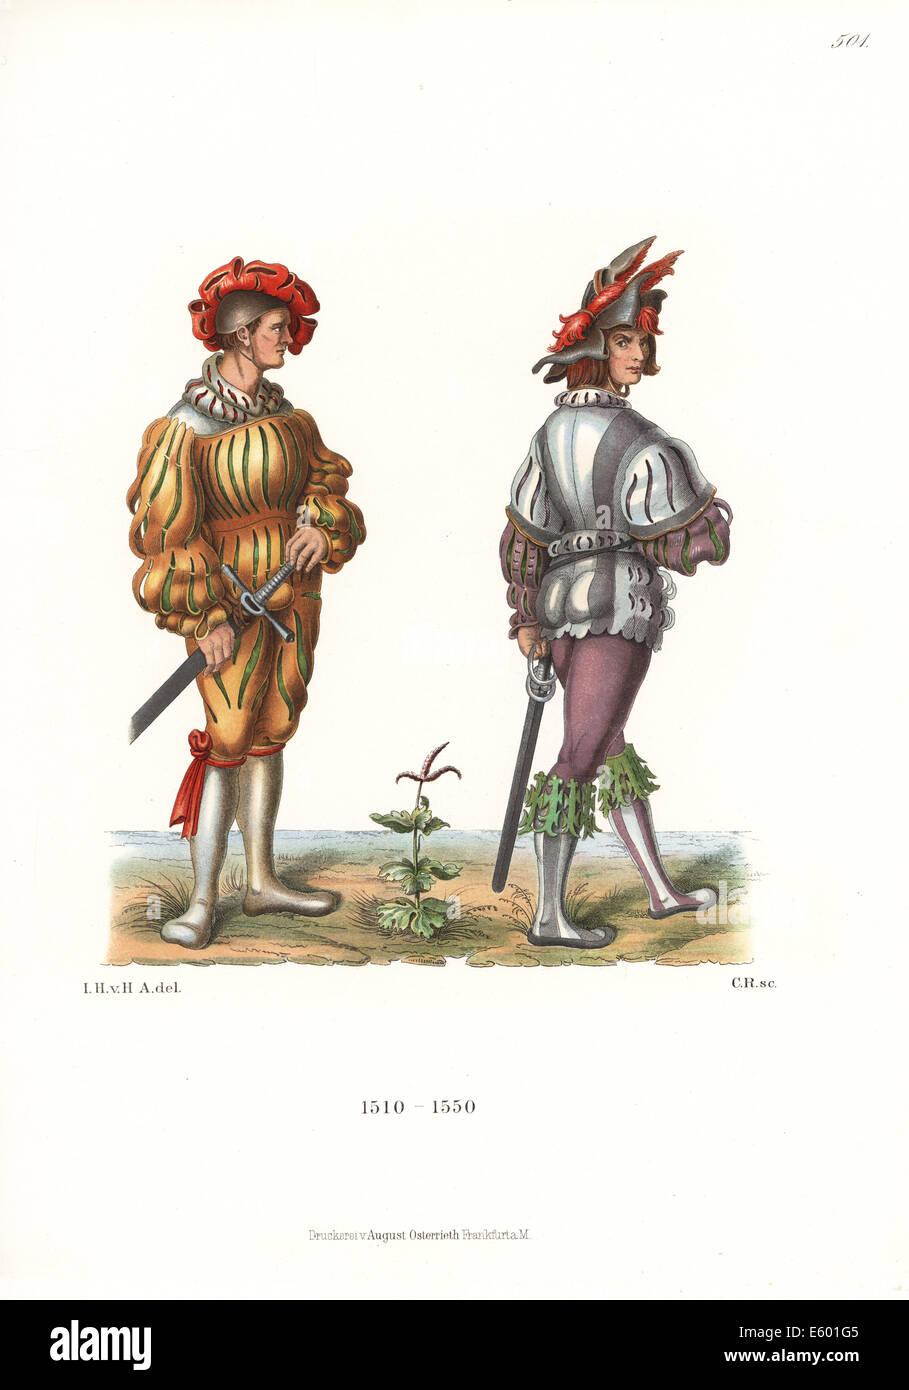 Costumes of Landsknechte or German mercenaries, 16th century. - Stock Image